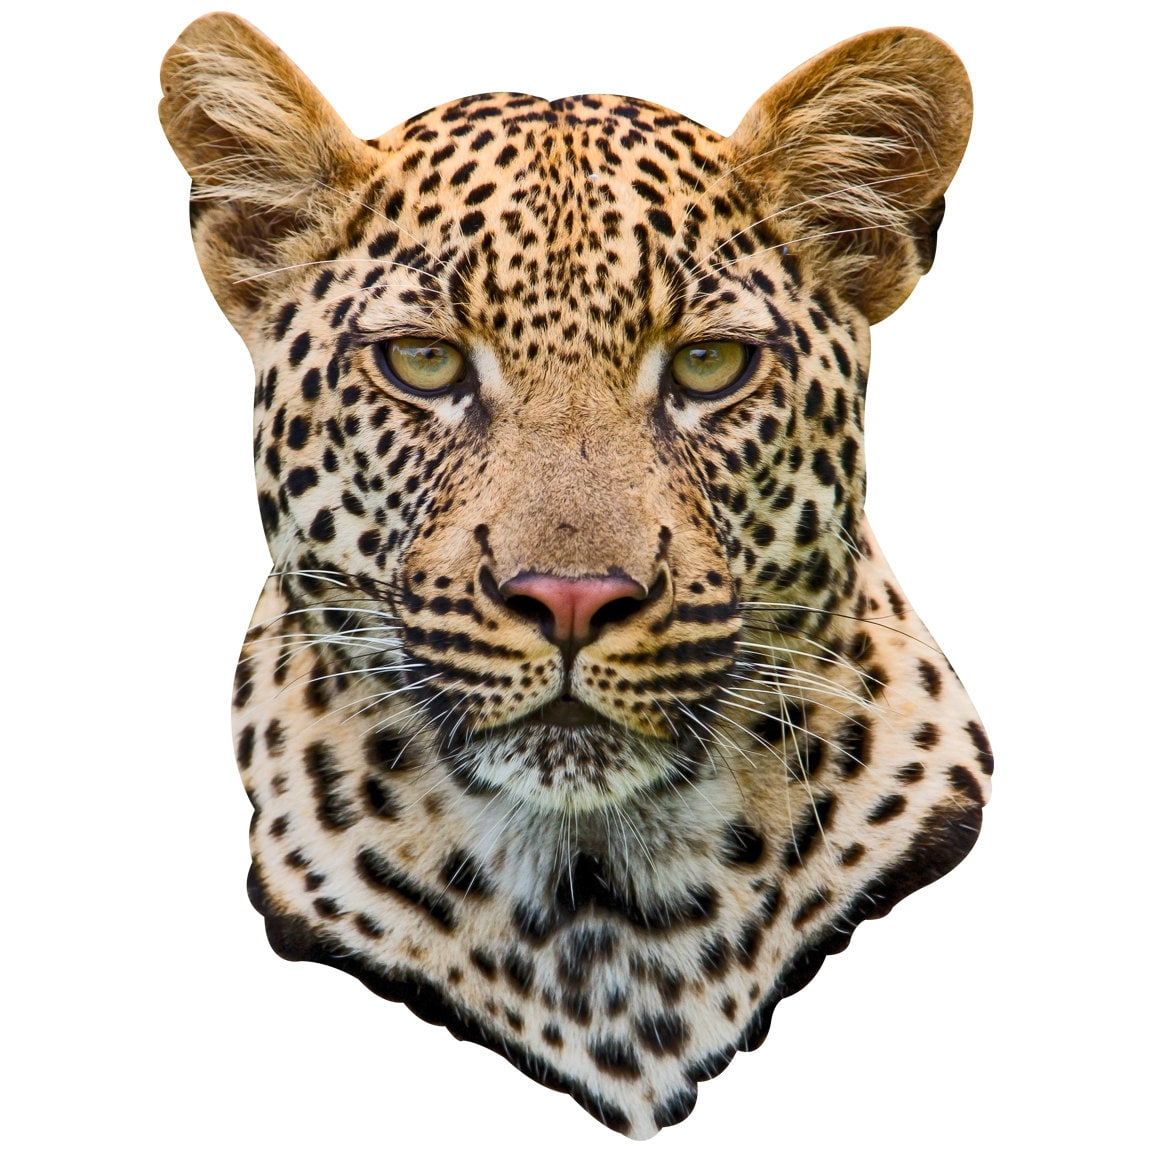 морда леопарда фото рисунок симптома является